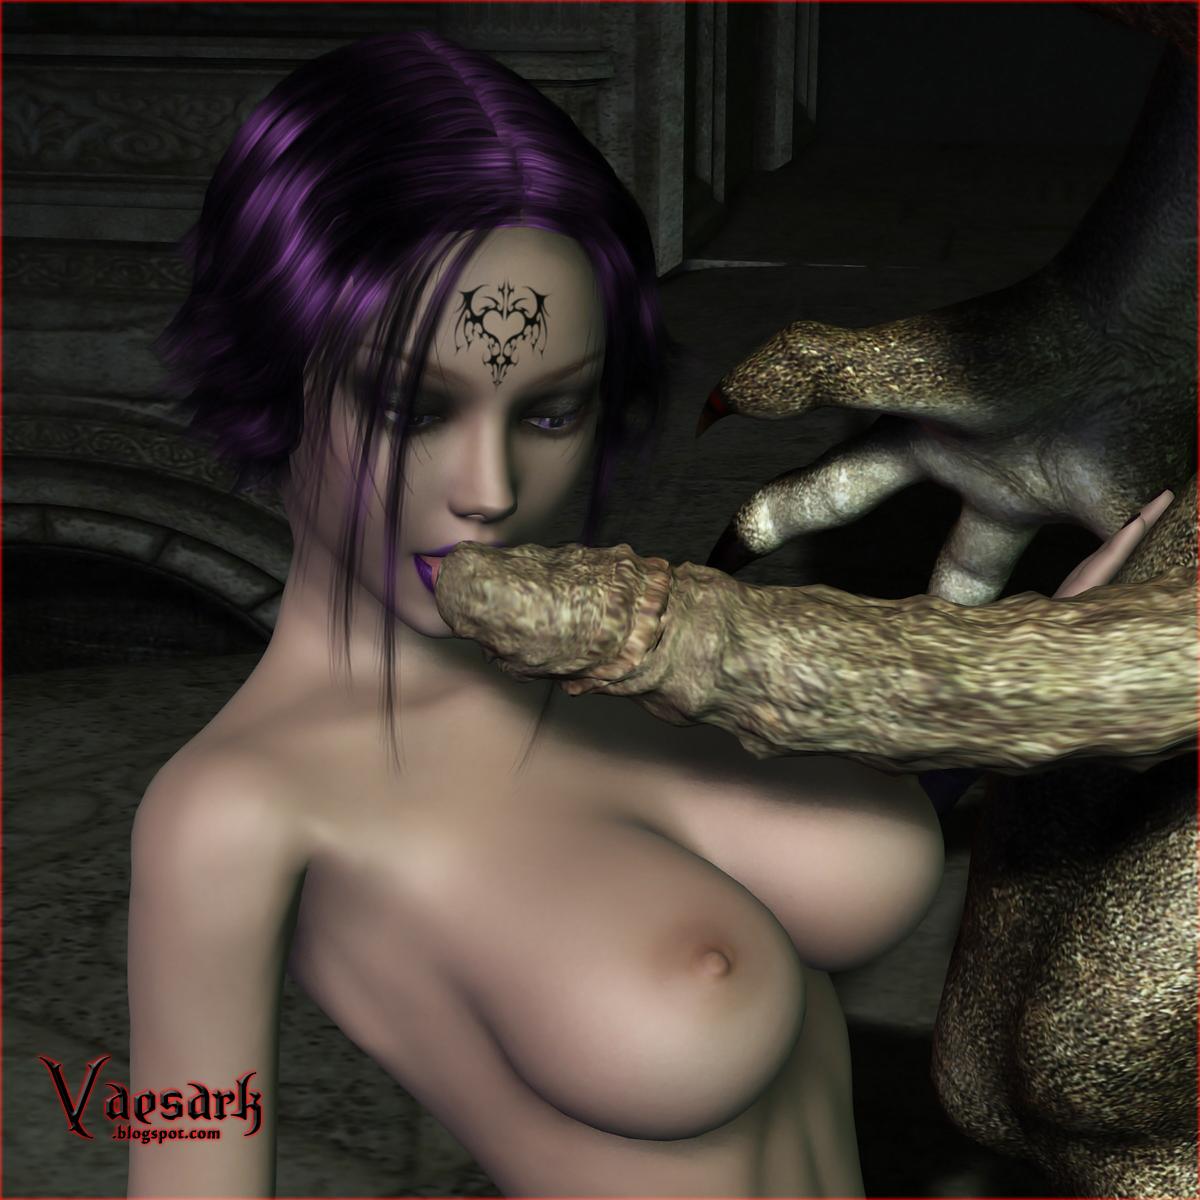 Monstersexcartoons pics erotic videos